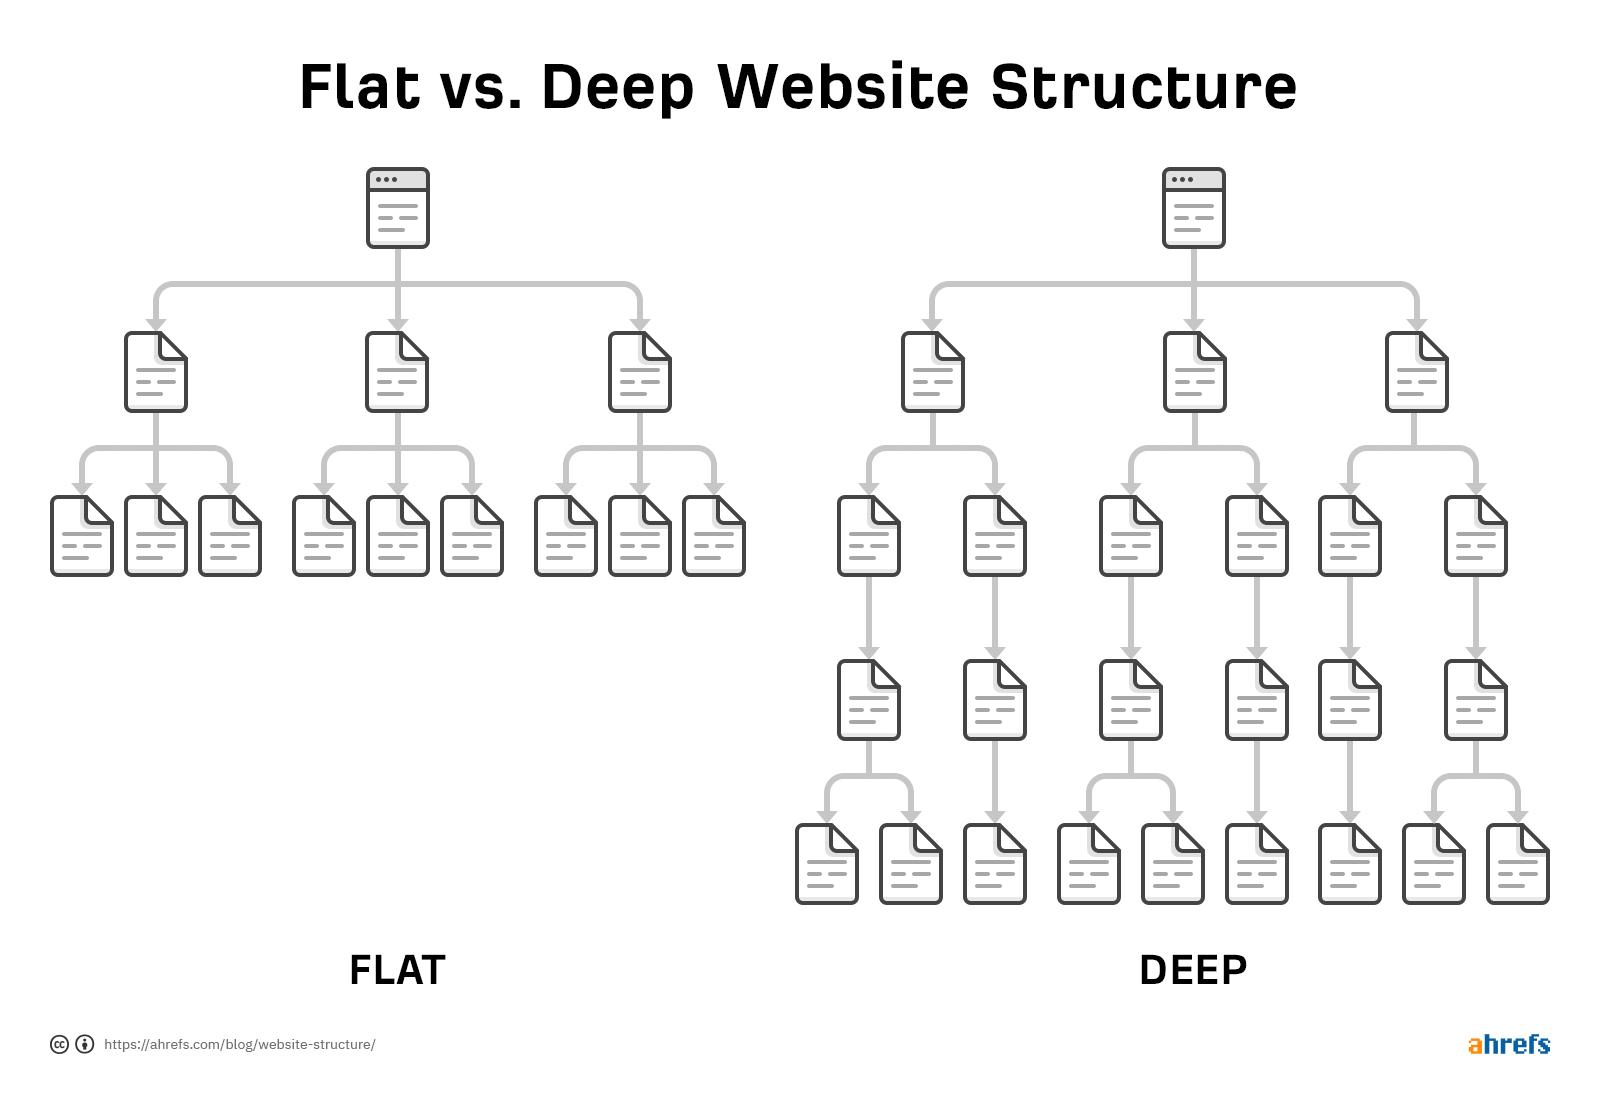 Lập cấu trúc website trên trang hiện có